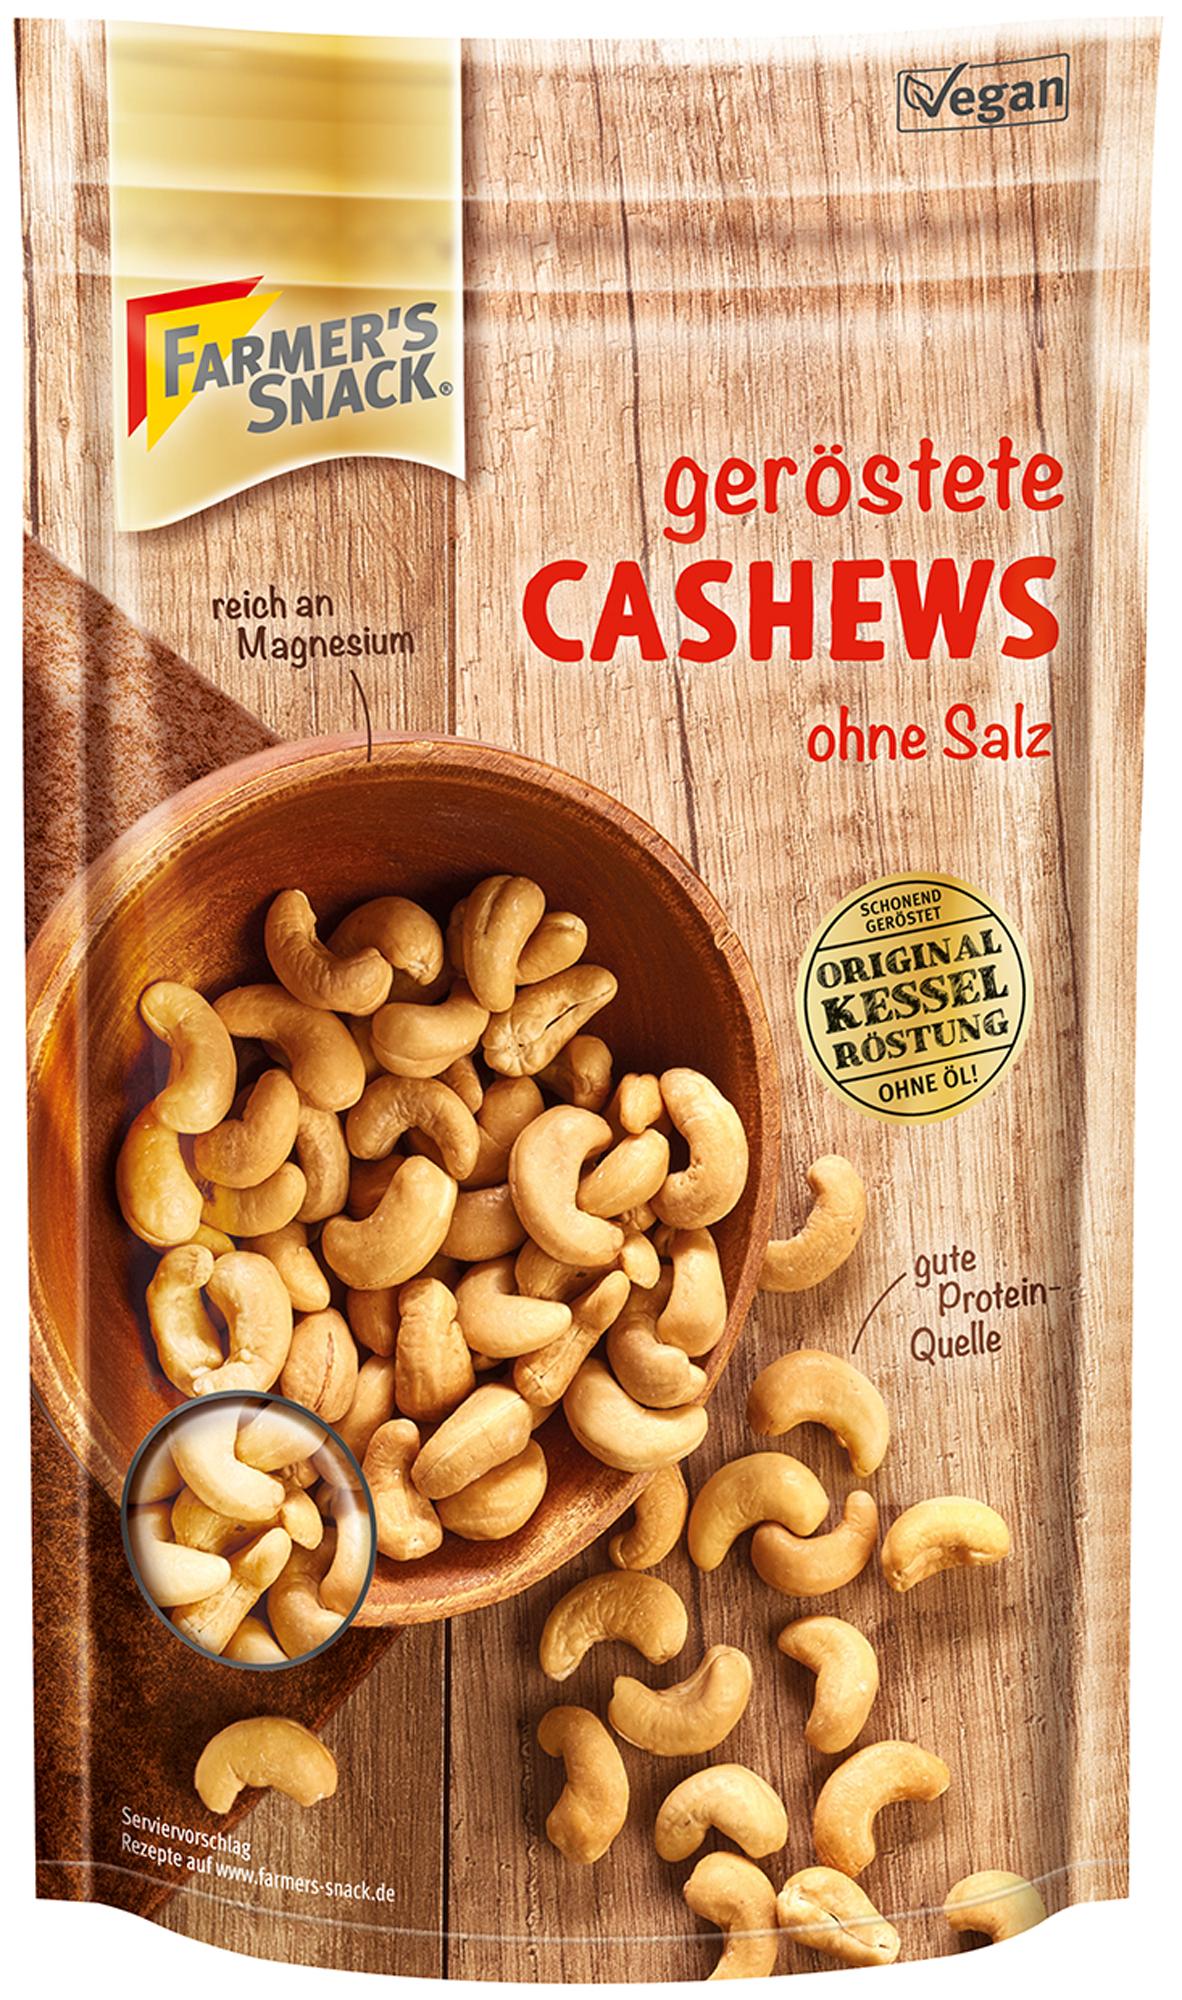 Cashew geröstet<br>(FARMER'S SNACK)